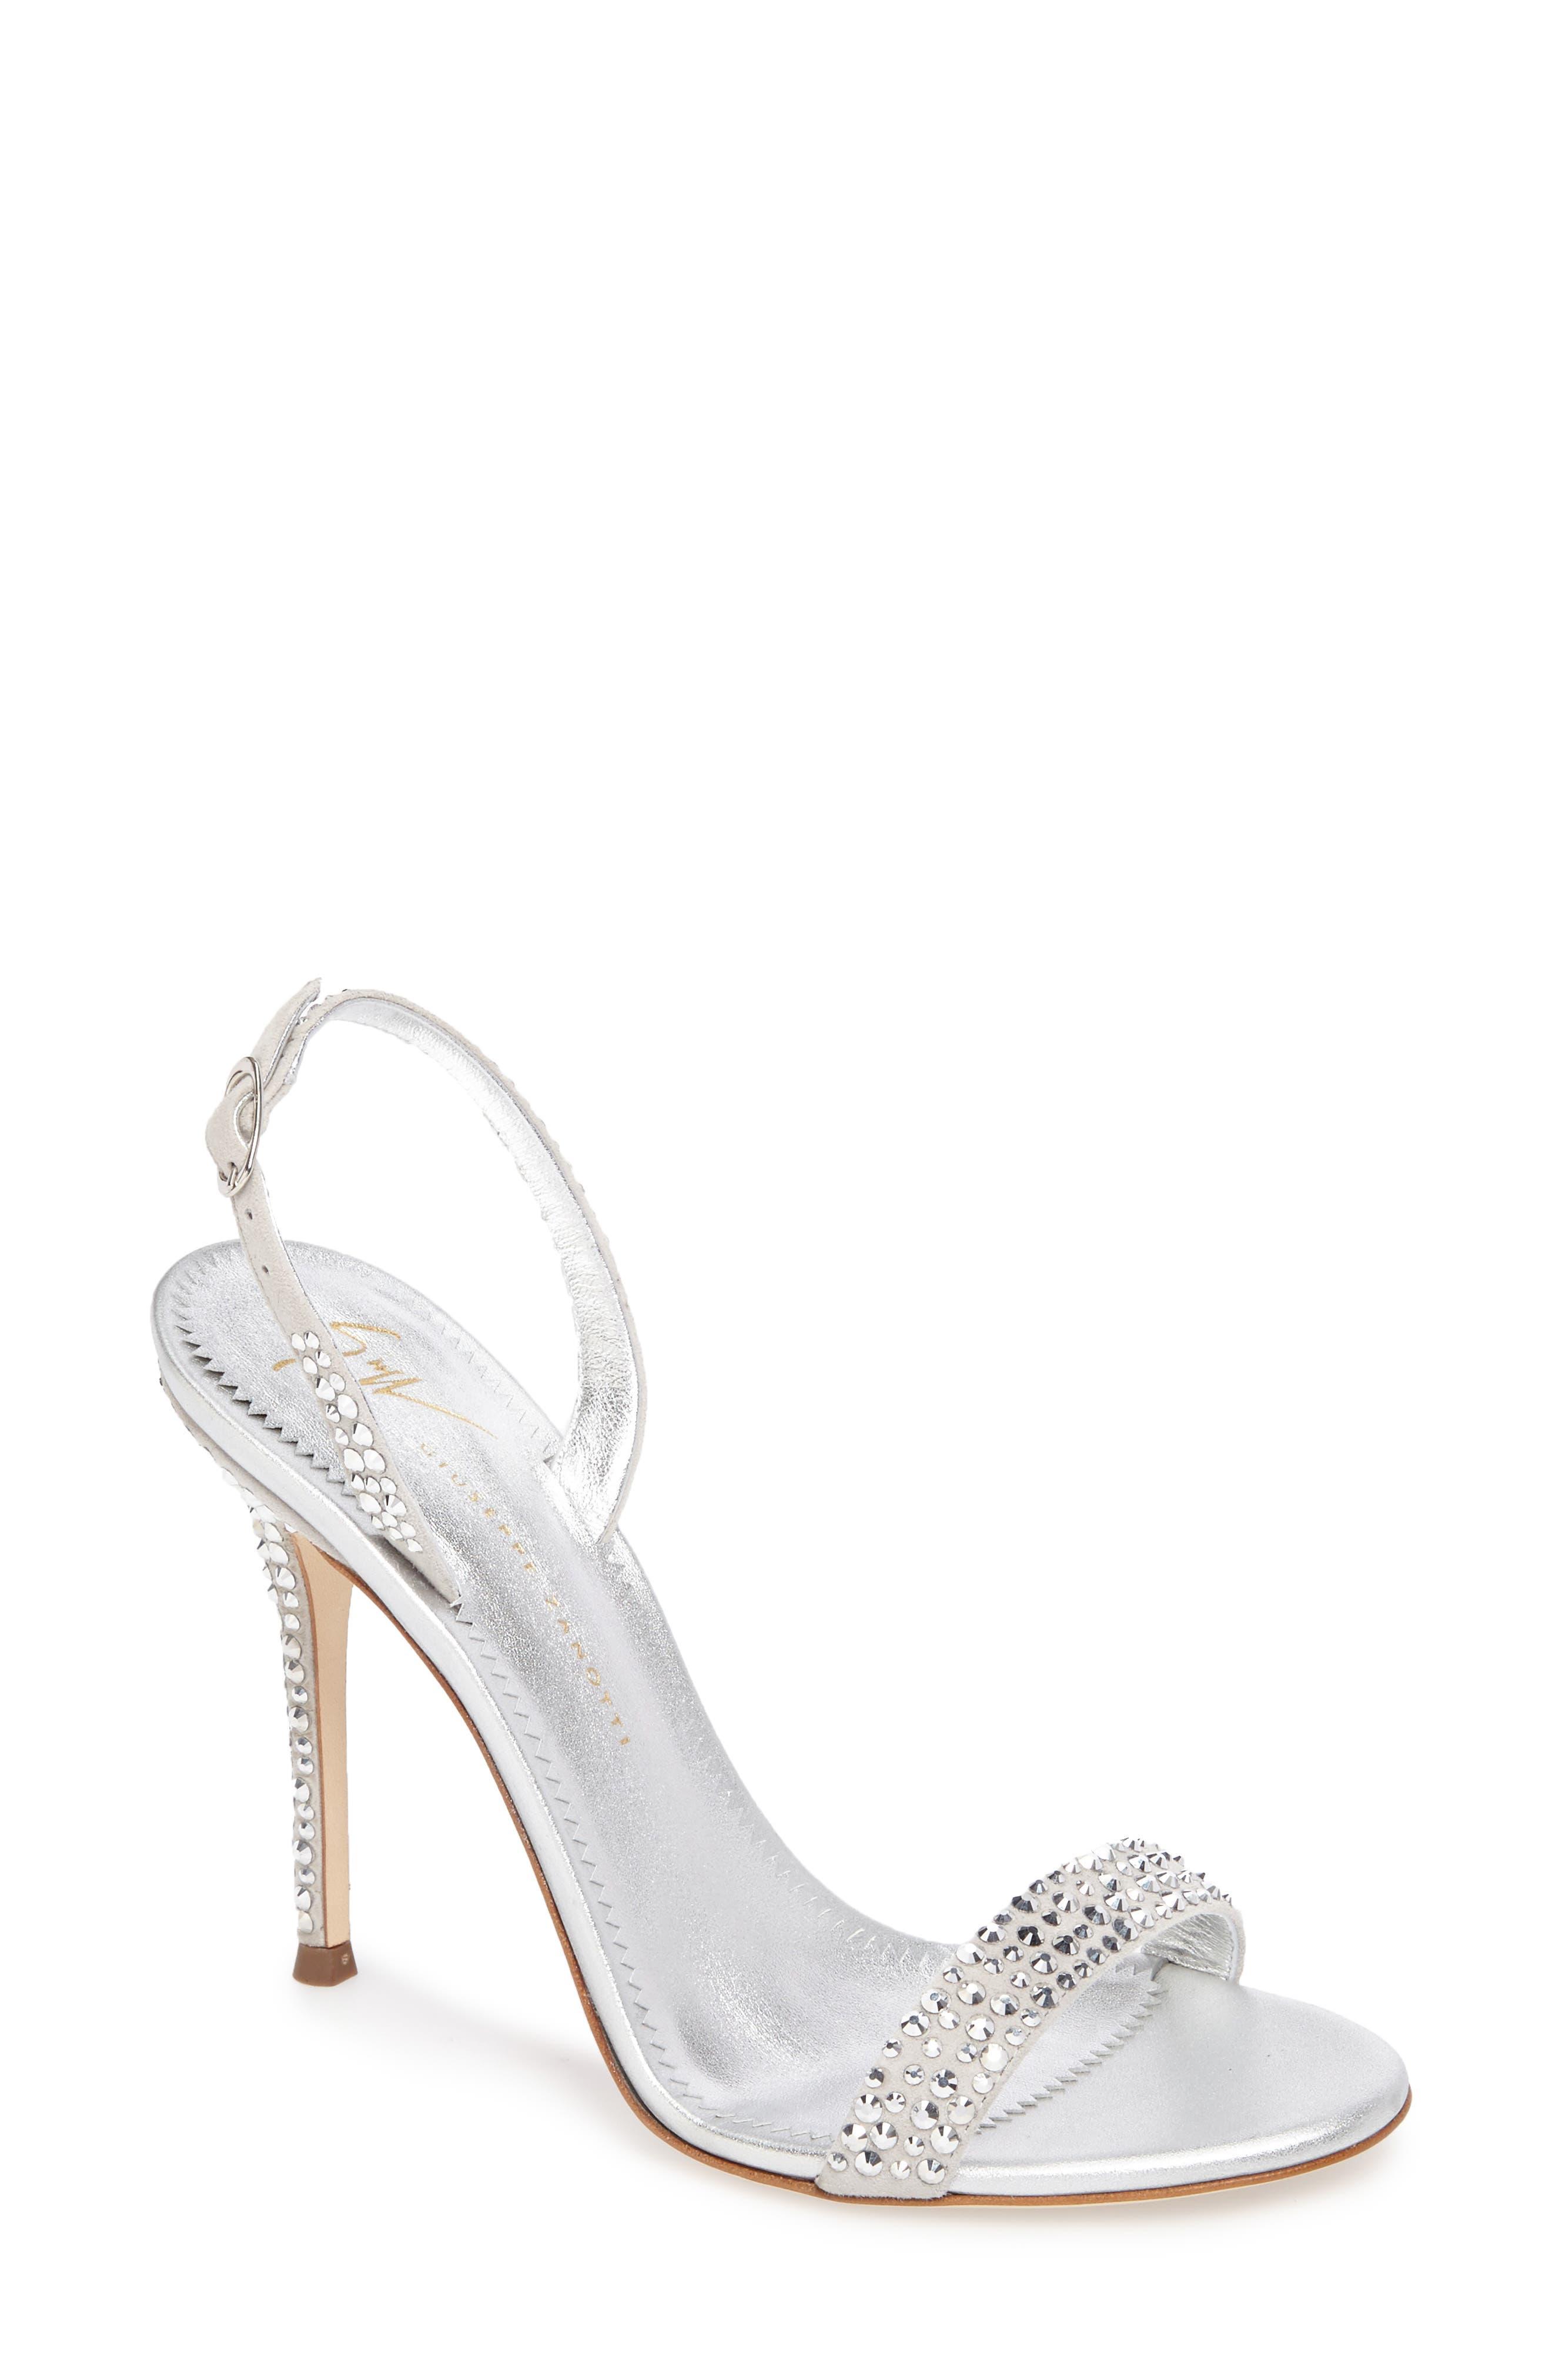 Alternate Image 1 Selected - Giuseppe Zanotti Musitco Crystal Embellished Slingback Sandal (Women)